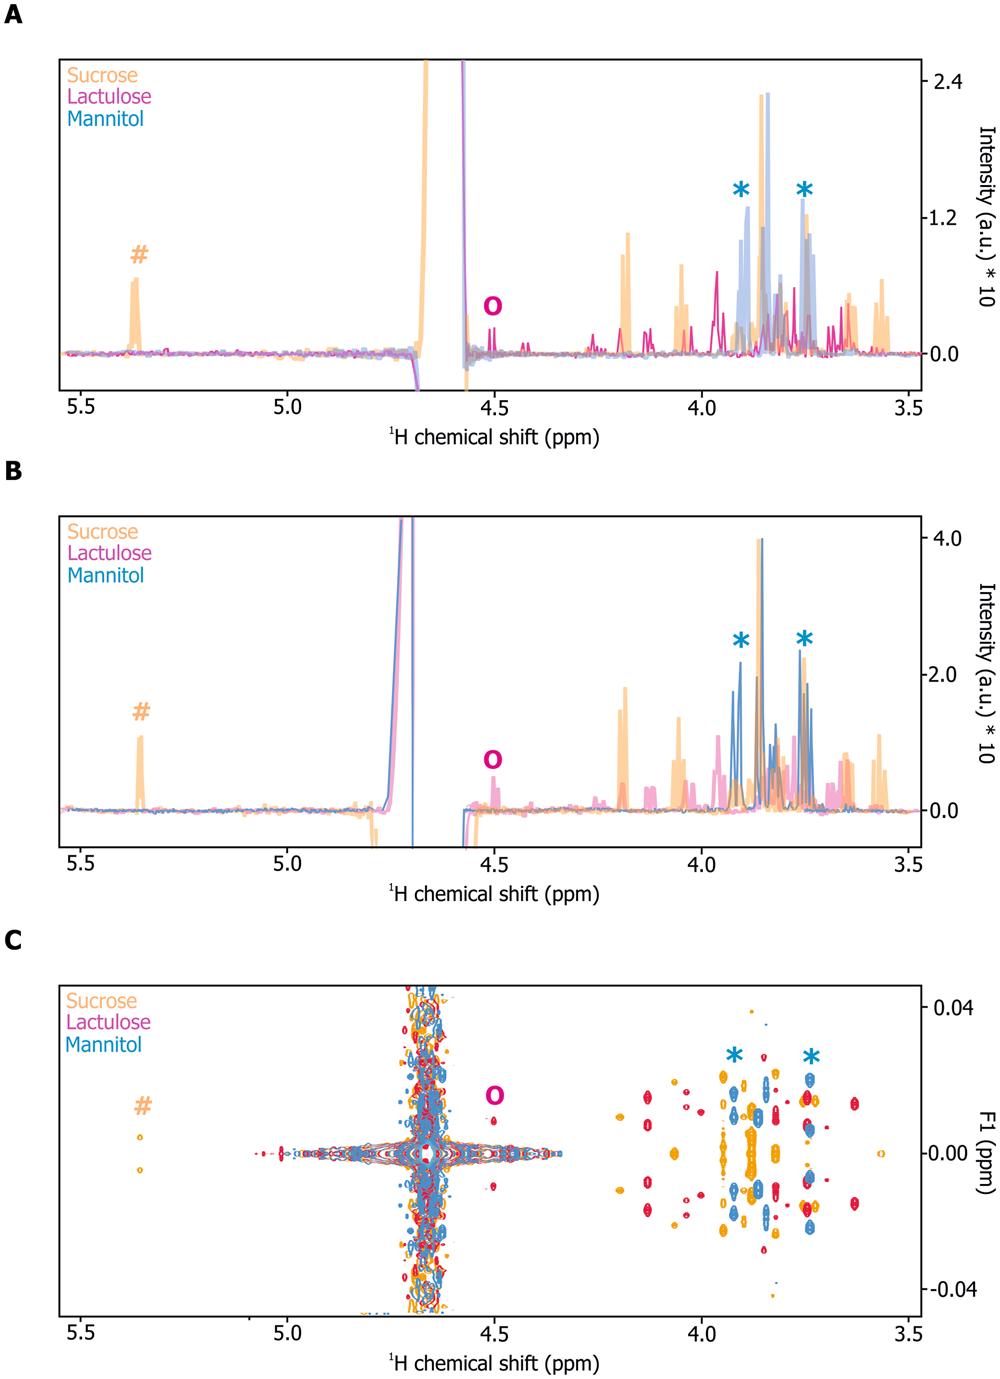 NMR spectroscopy enables simultaneous quantification of